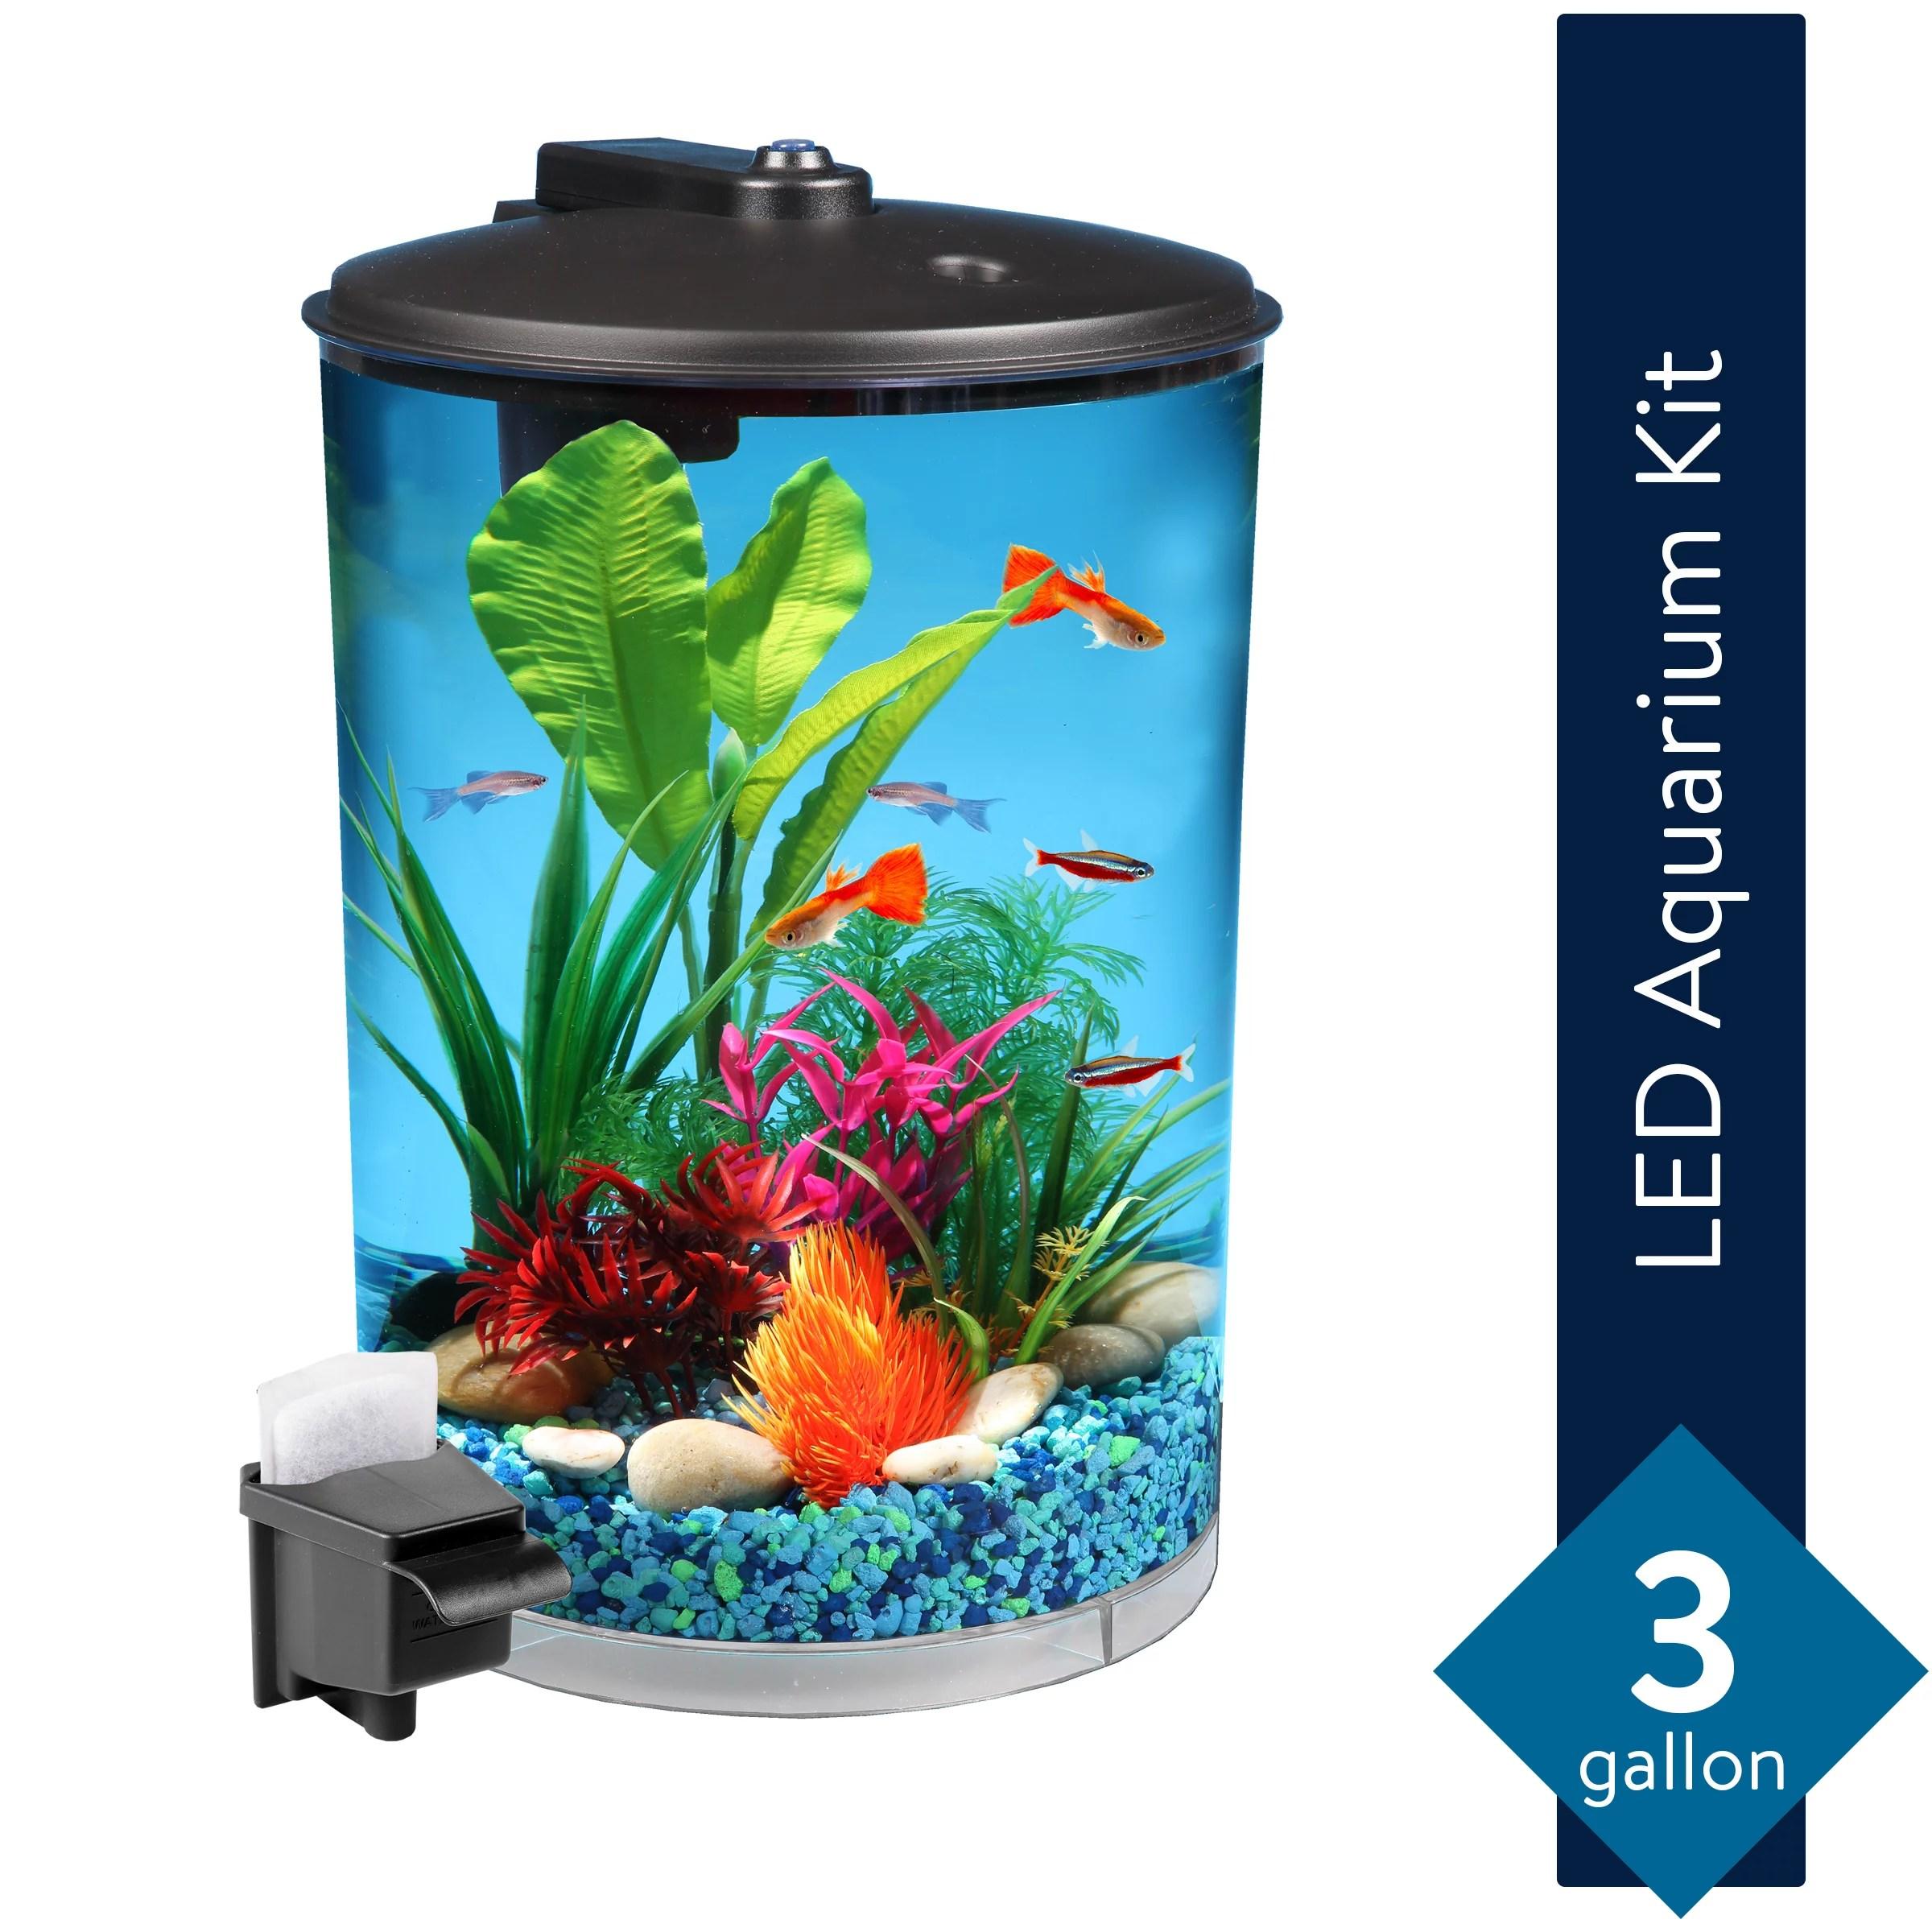 aqua culture 3 gallon 360 view aquarium kit with led lighting and power filter walmart com